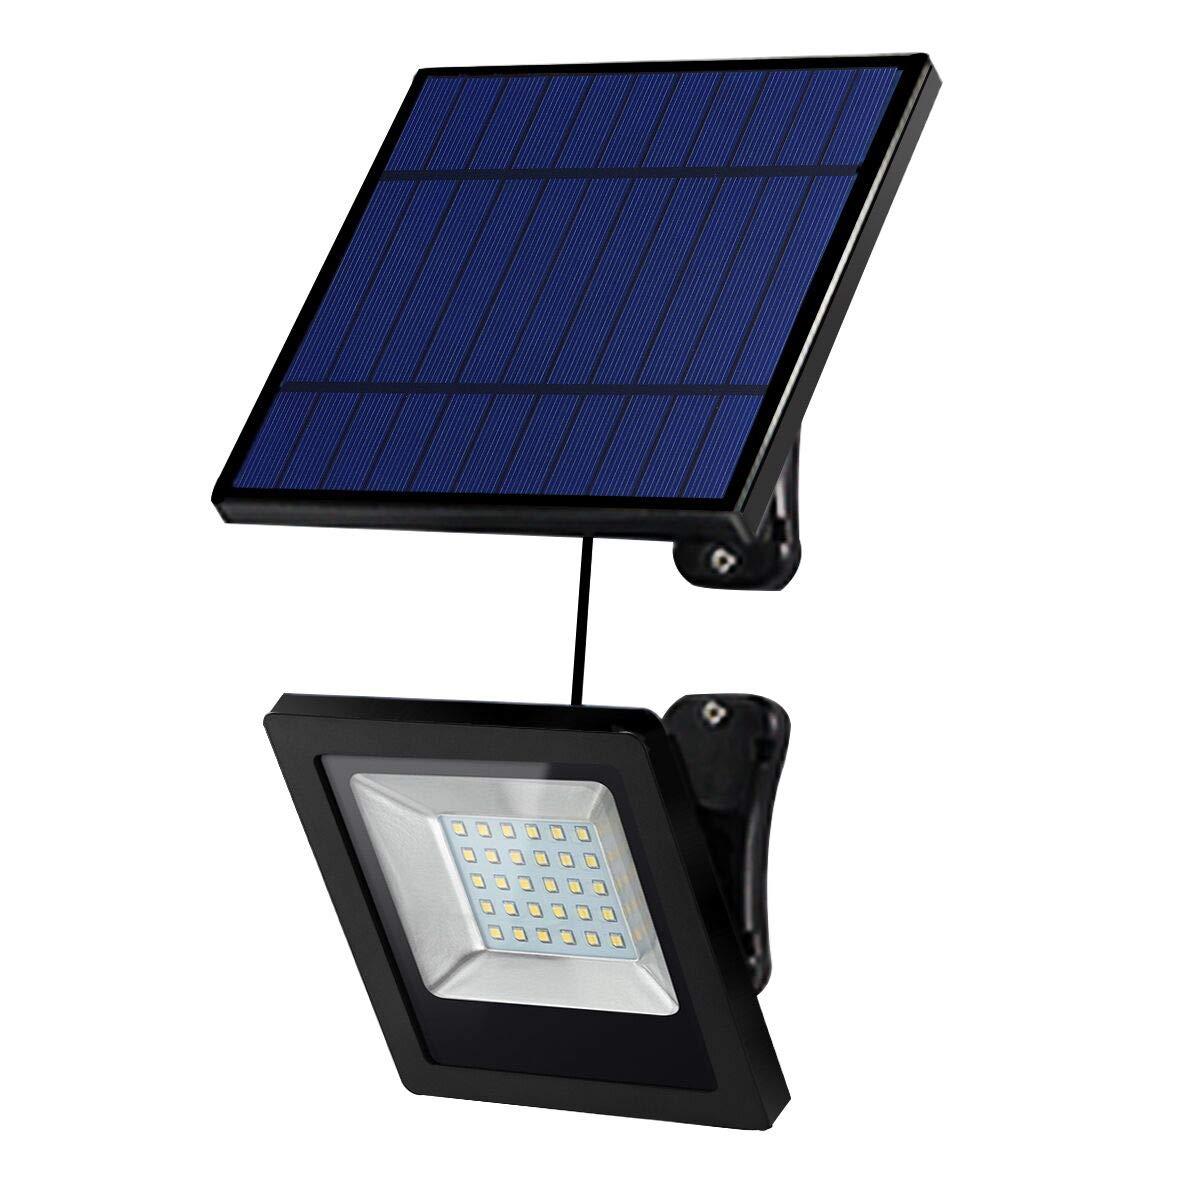 Solar Lights Outdoor, Hikeren IP65 Waterproof Solar Lights(White Light), 30 LED Spotlight, Easy-to-Install Security Lights for Front Door, Yard, Garage, Deck